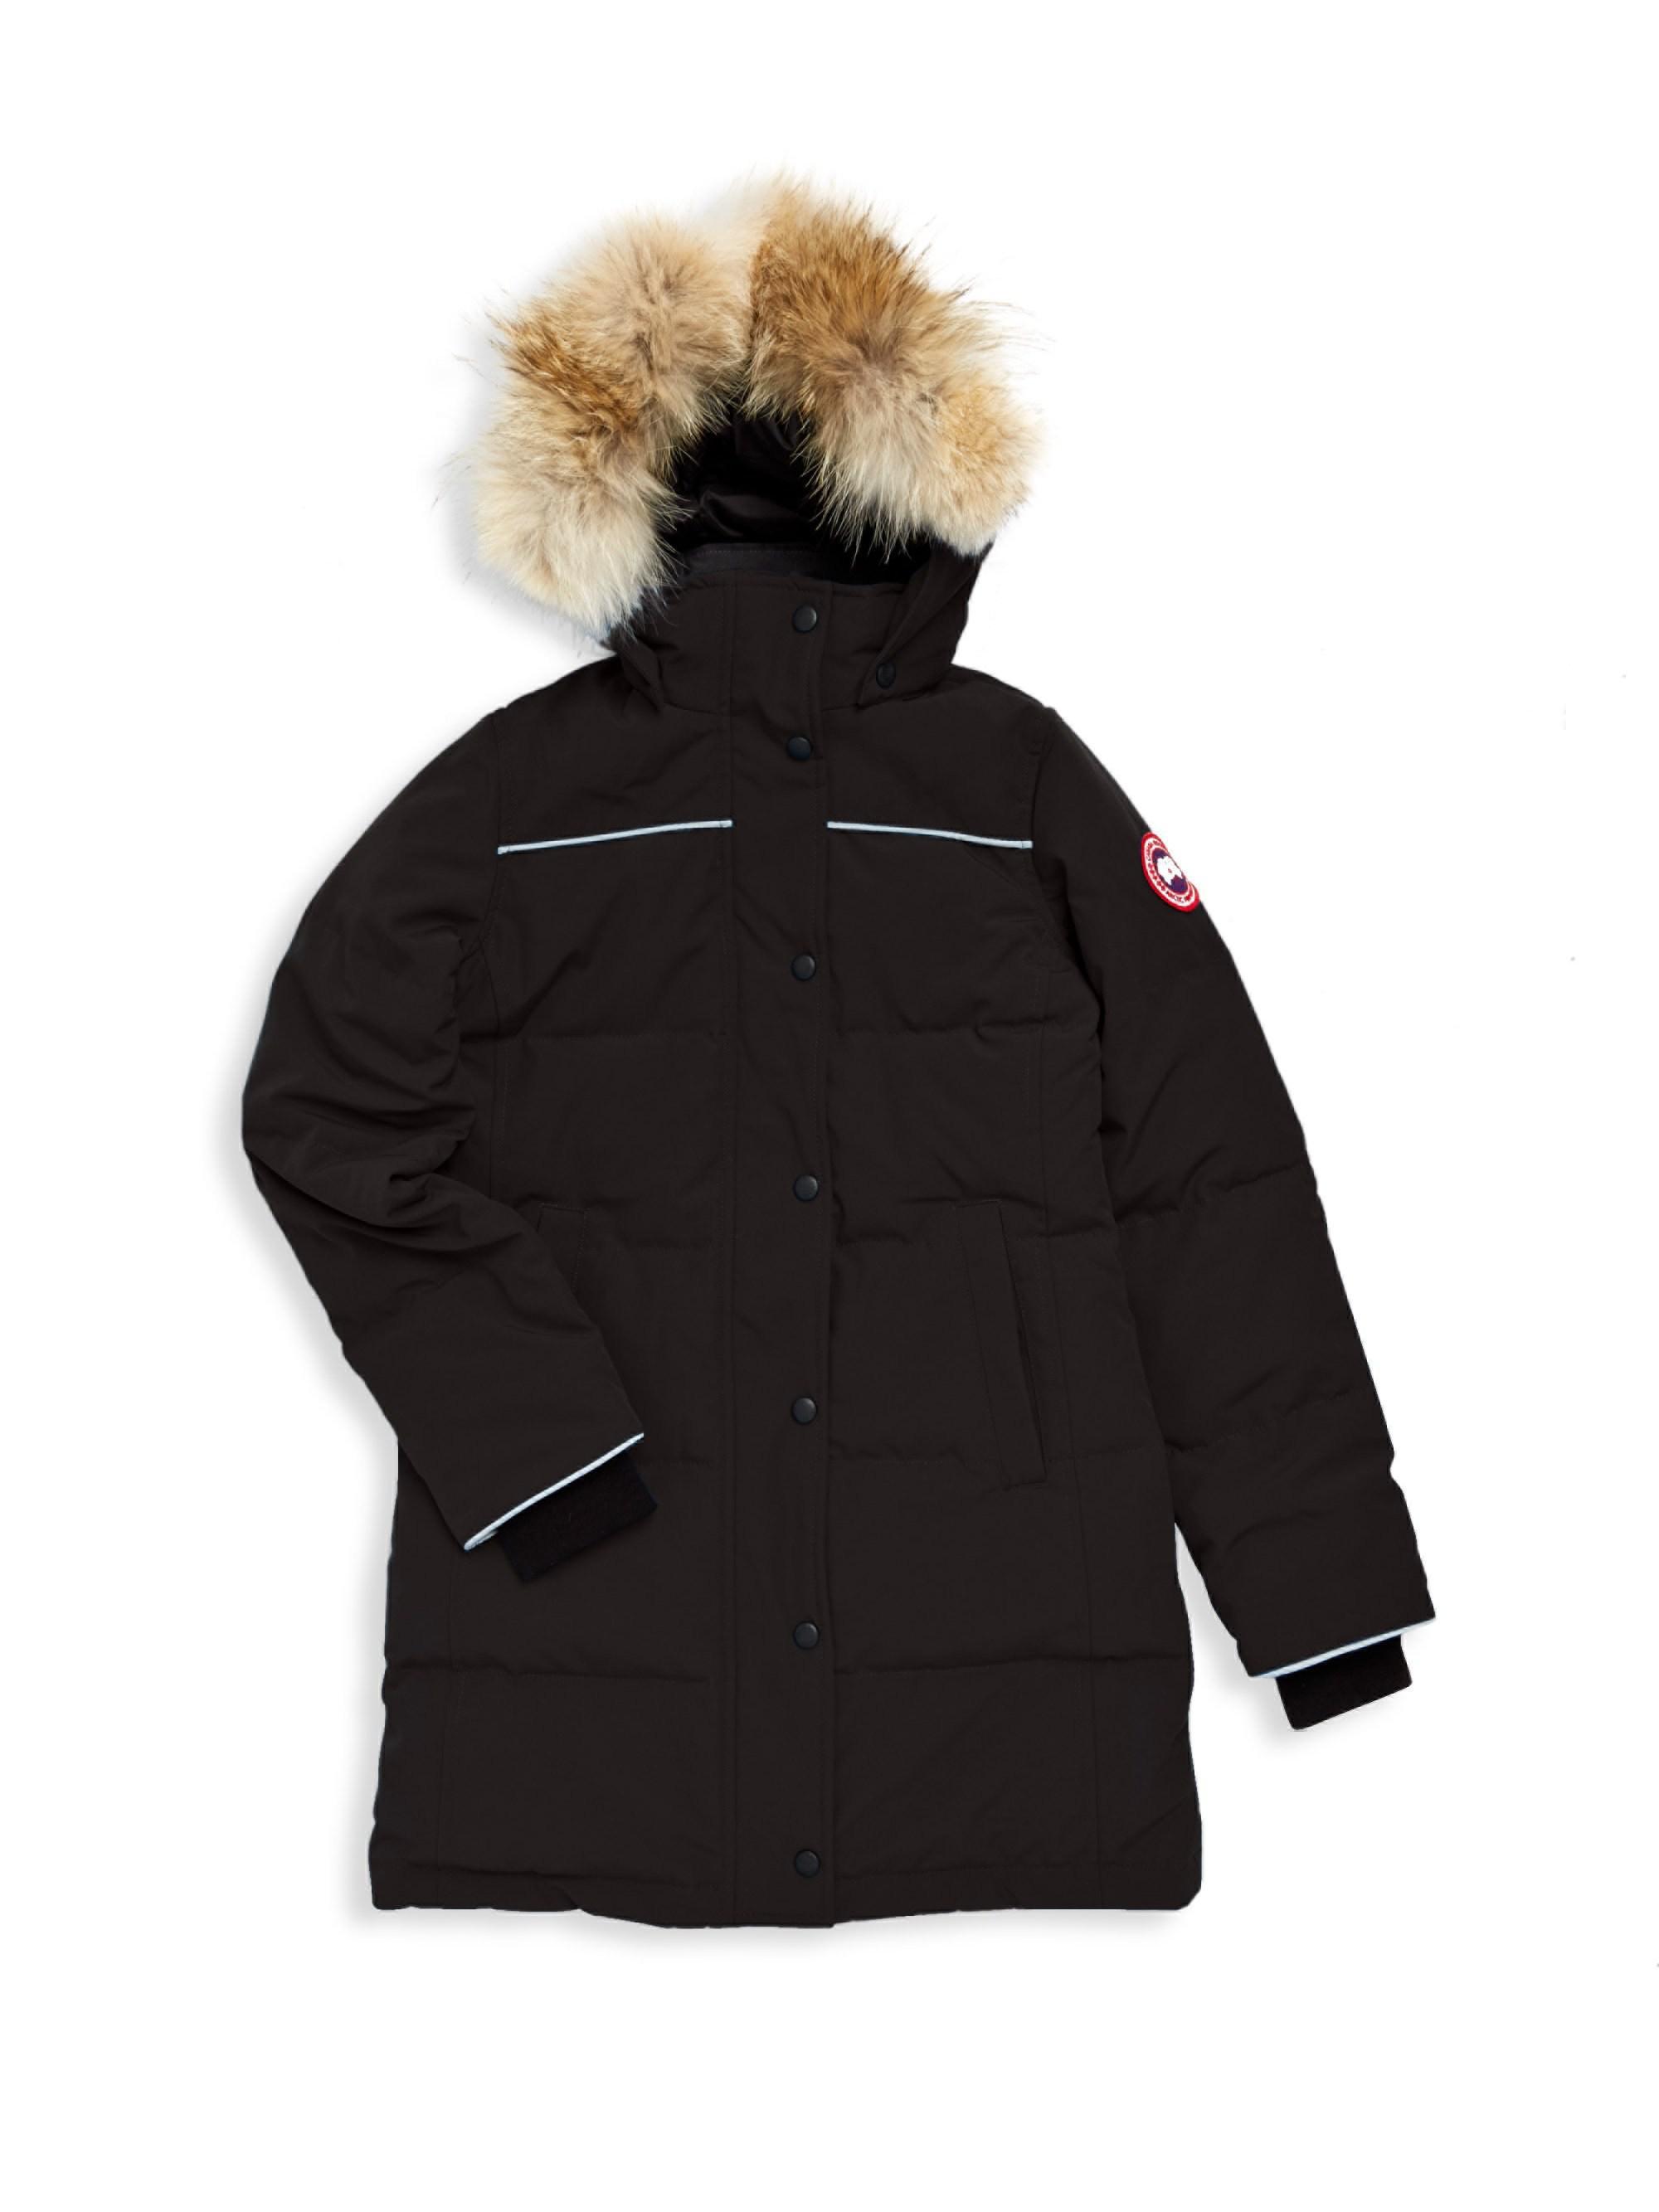 e17de65158c Canada Goose Youth Juniper Fur-trim Parka in Black - Lyst